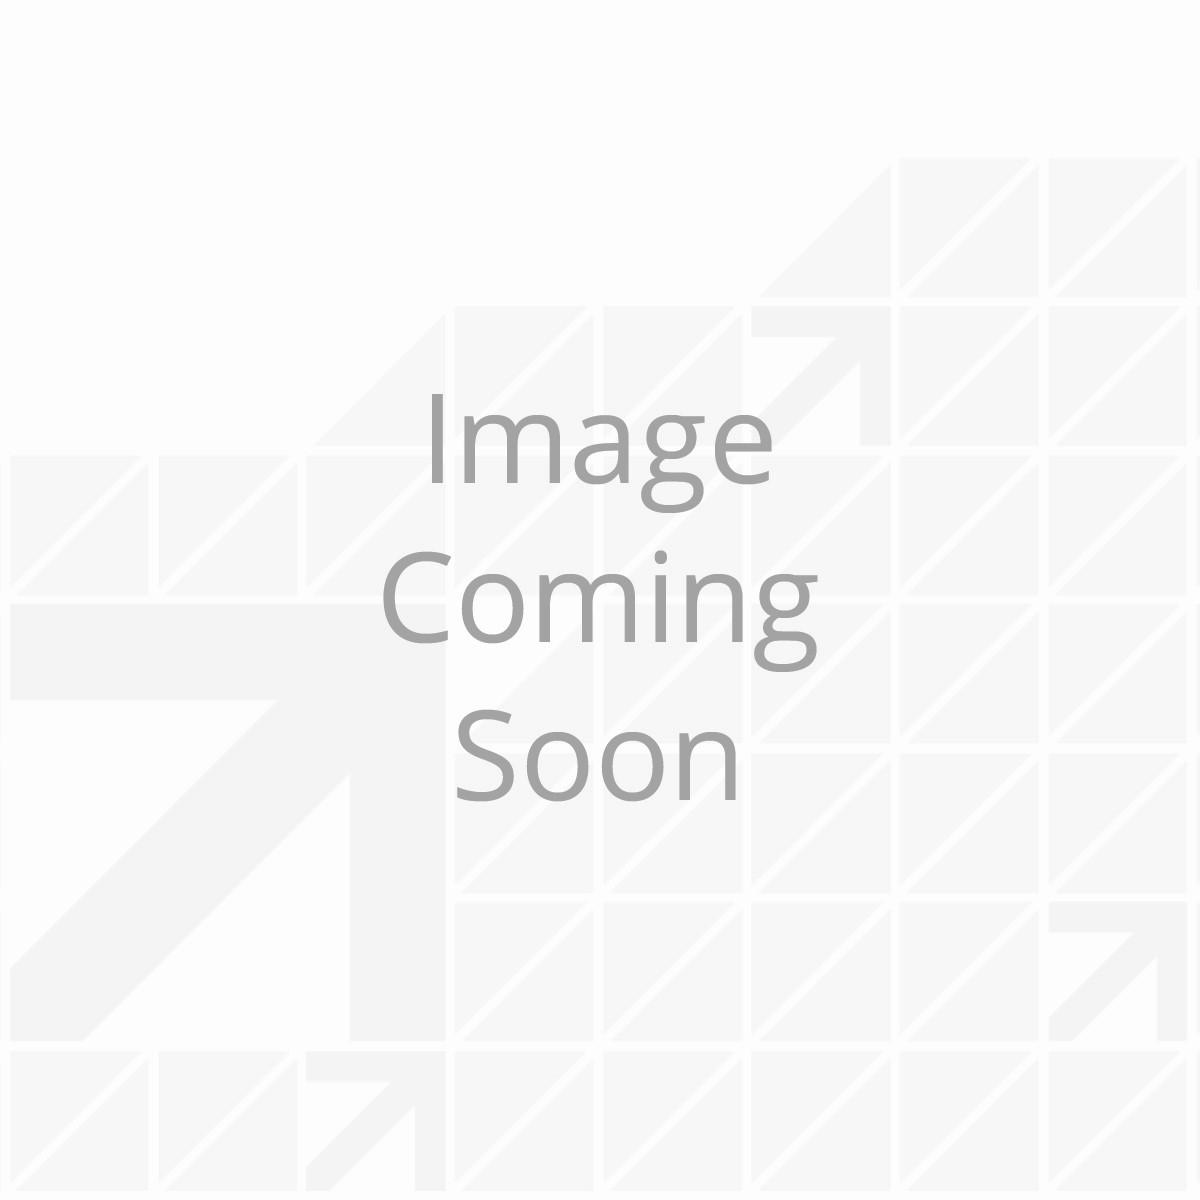 Thomas Payne® Adjustable Microfiber Sheet Set, White